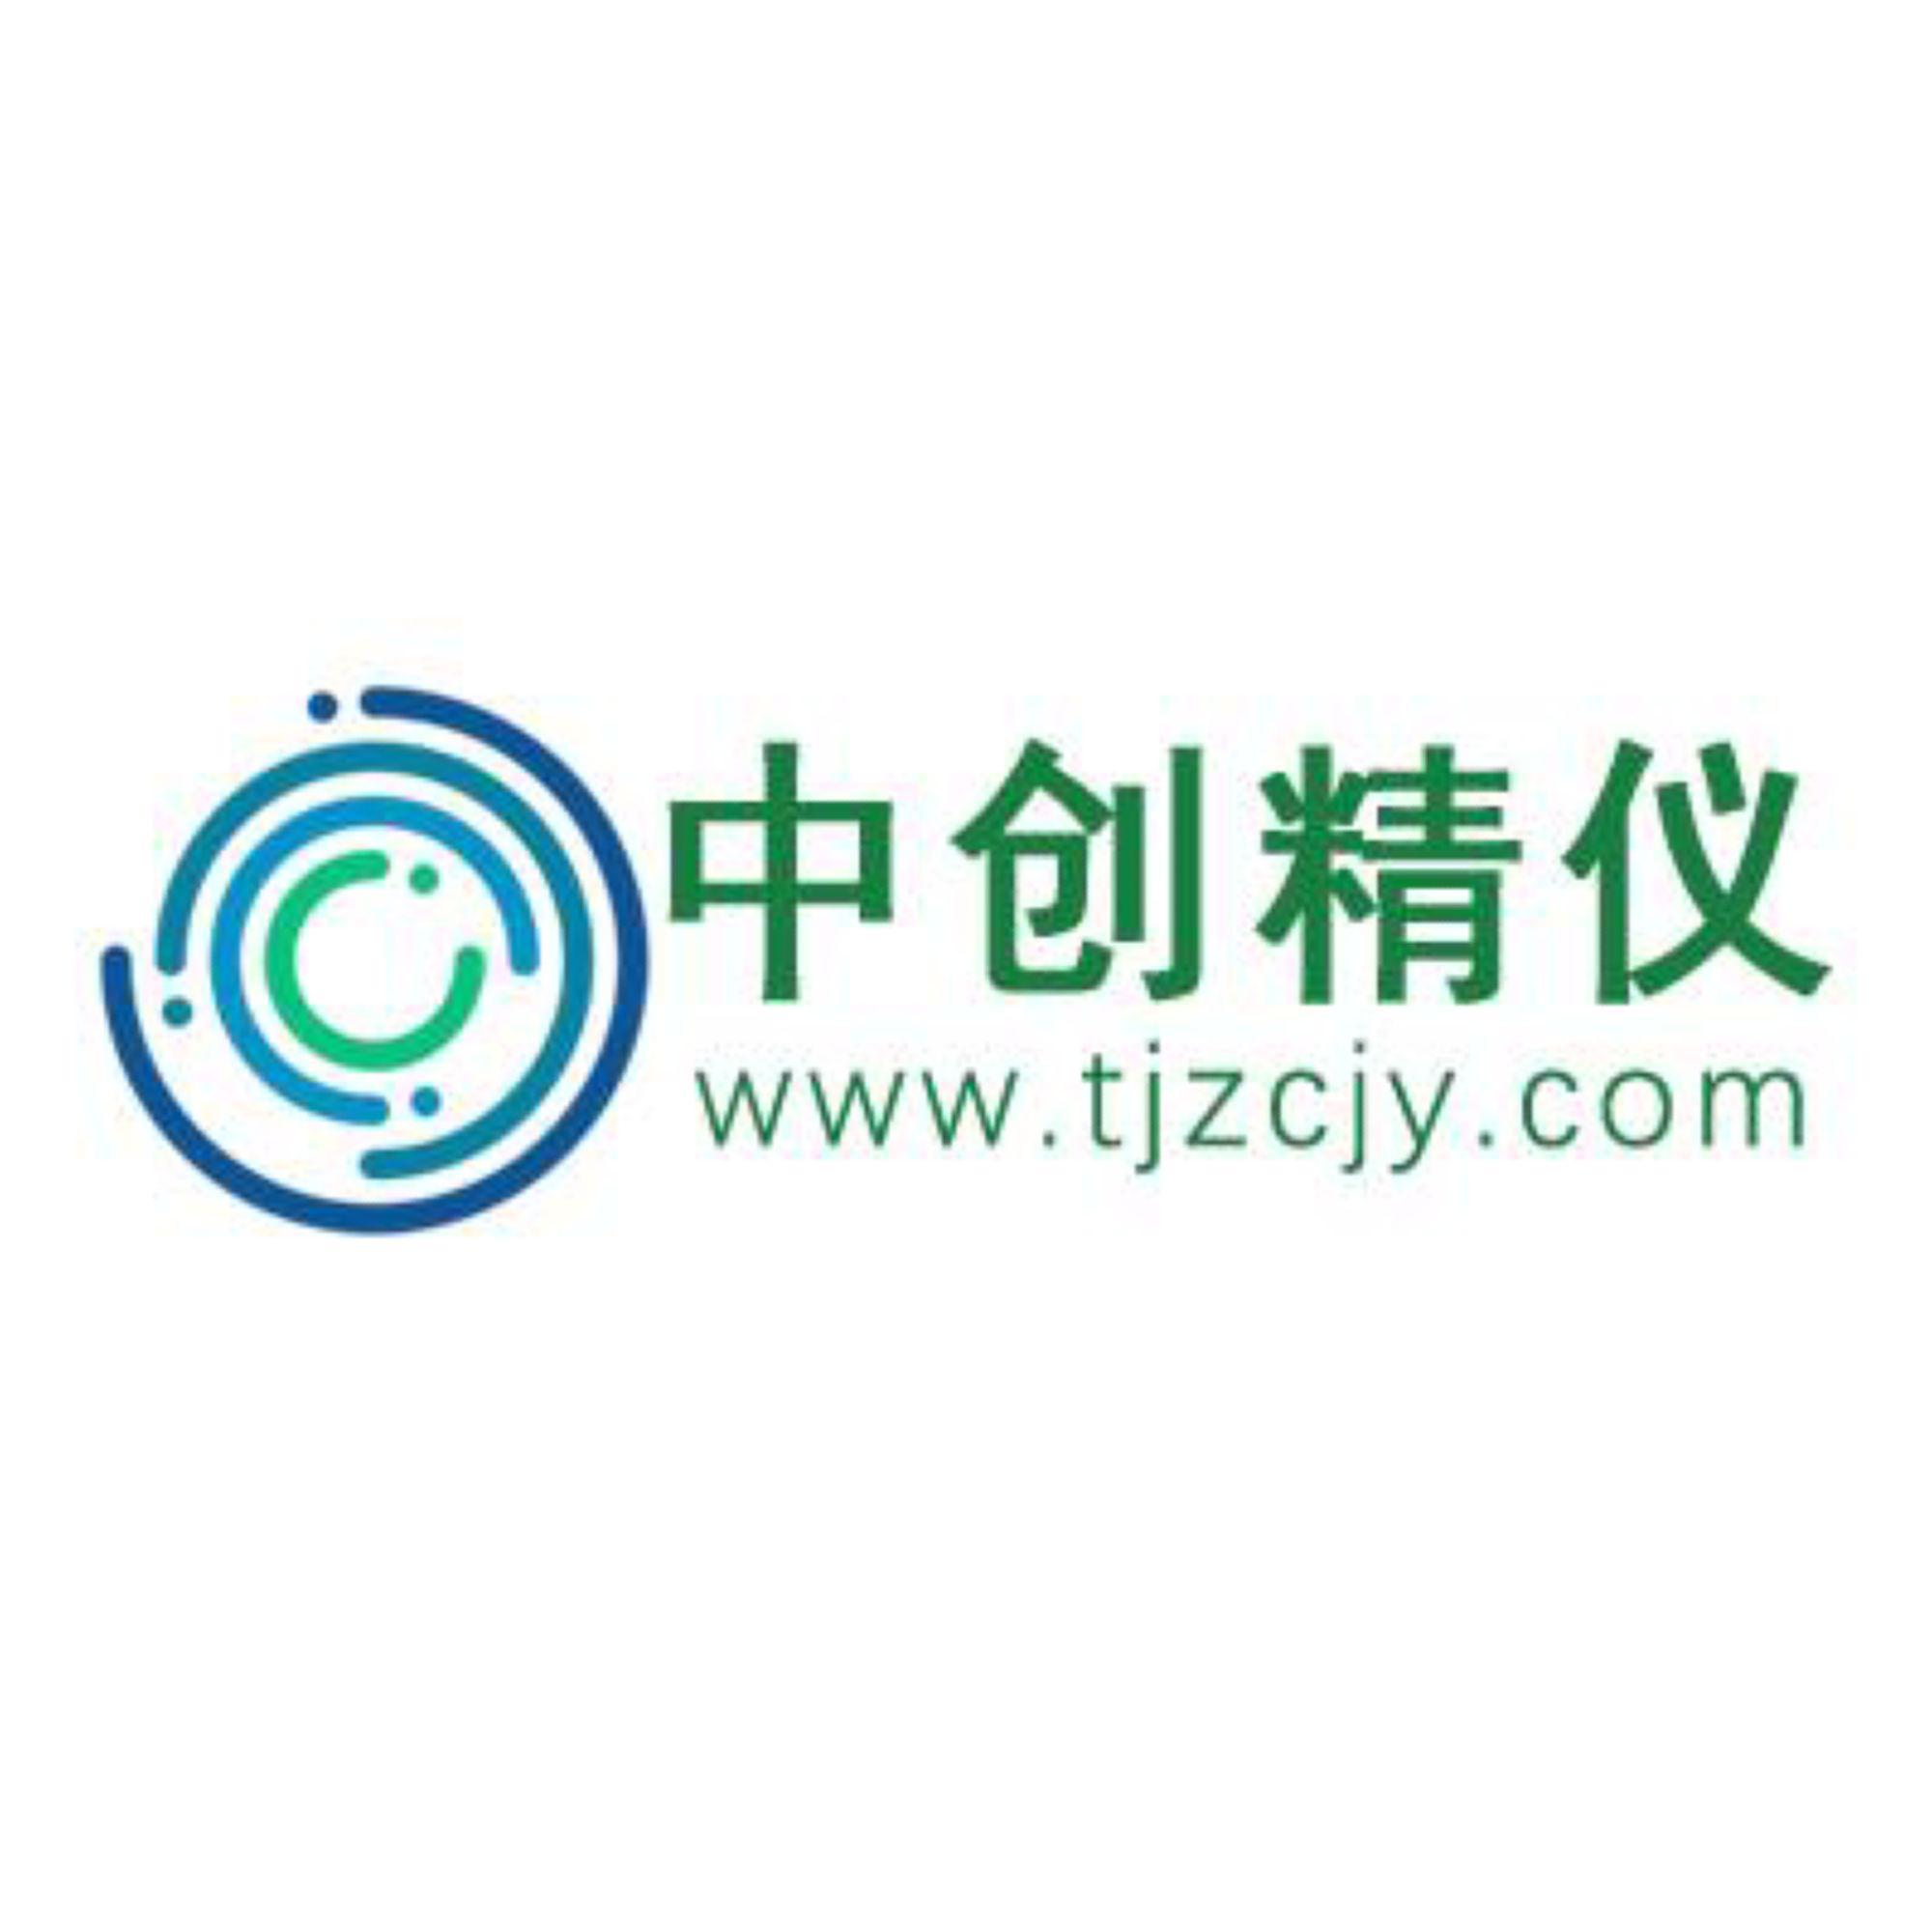 ZCJY-logo-deeplink_CN.png